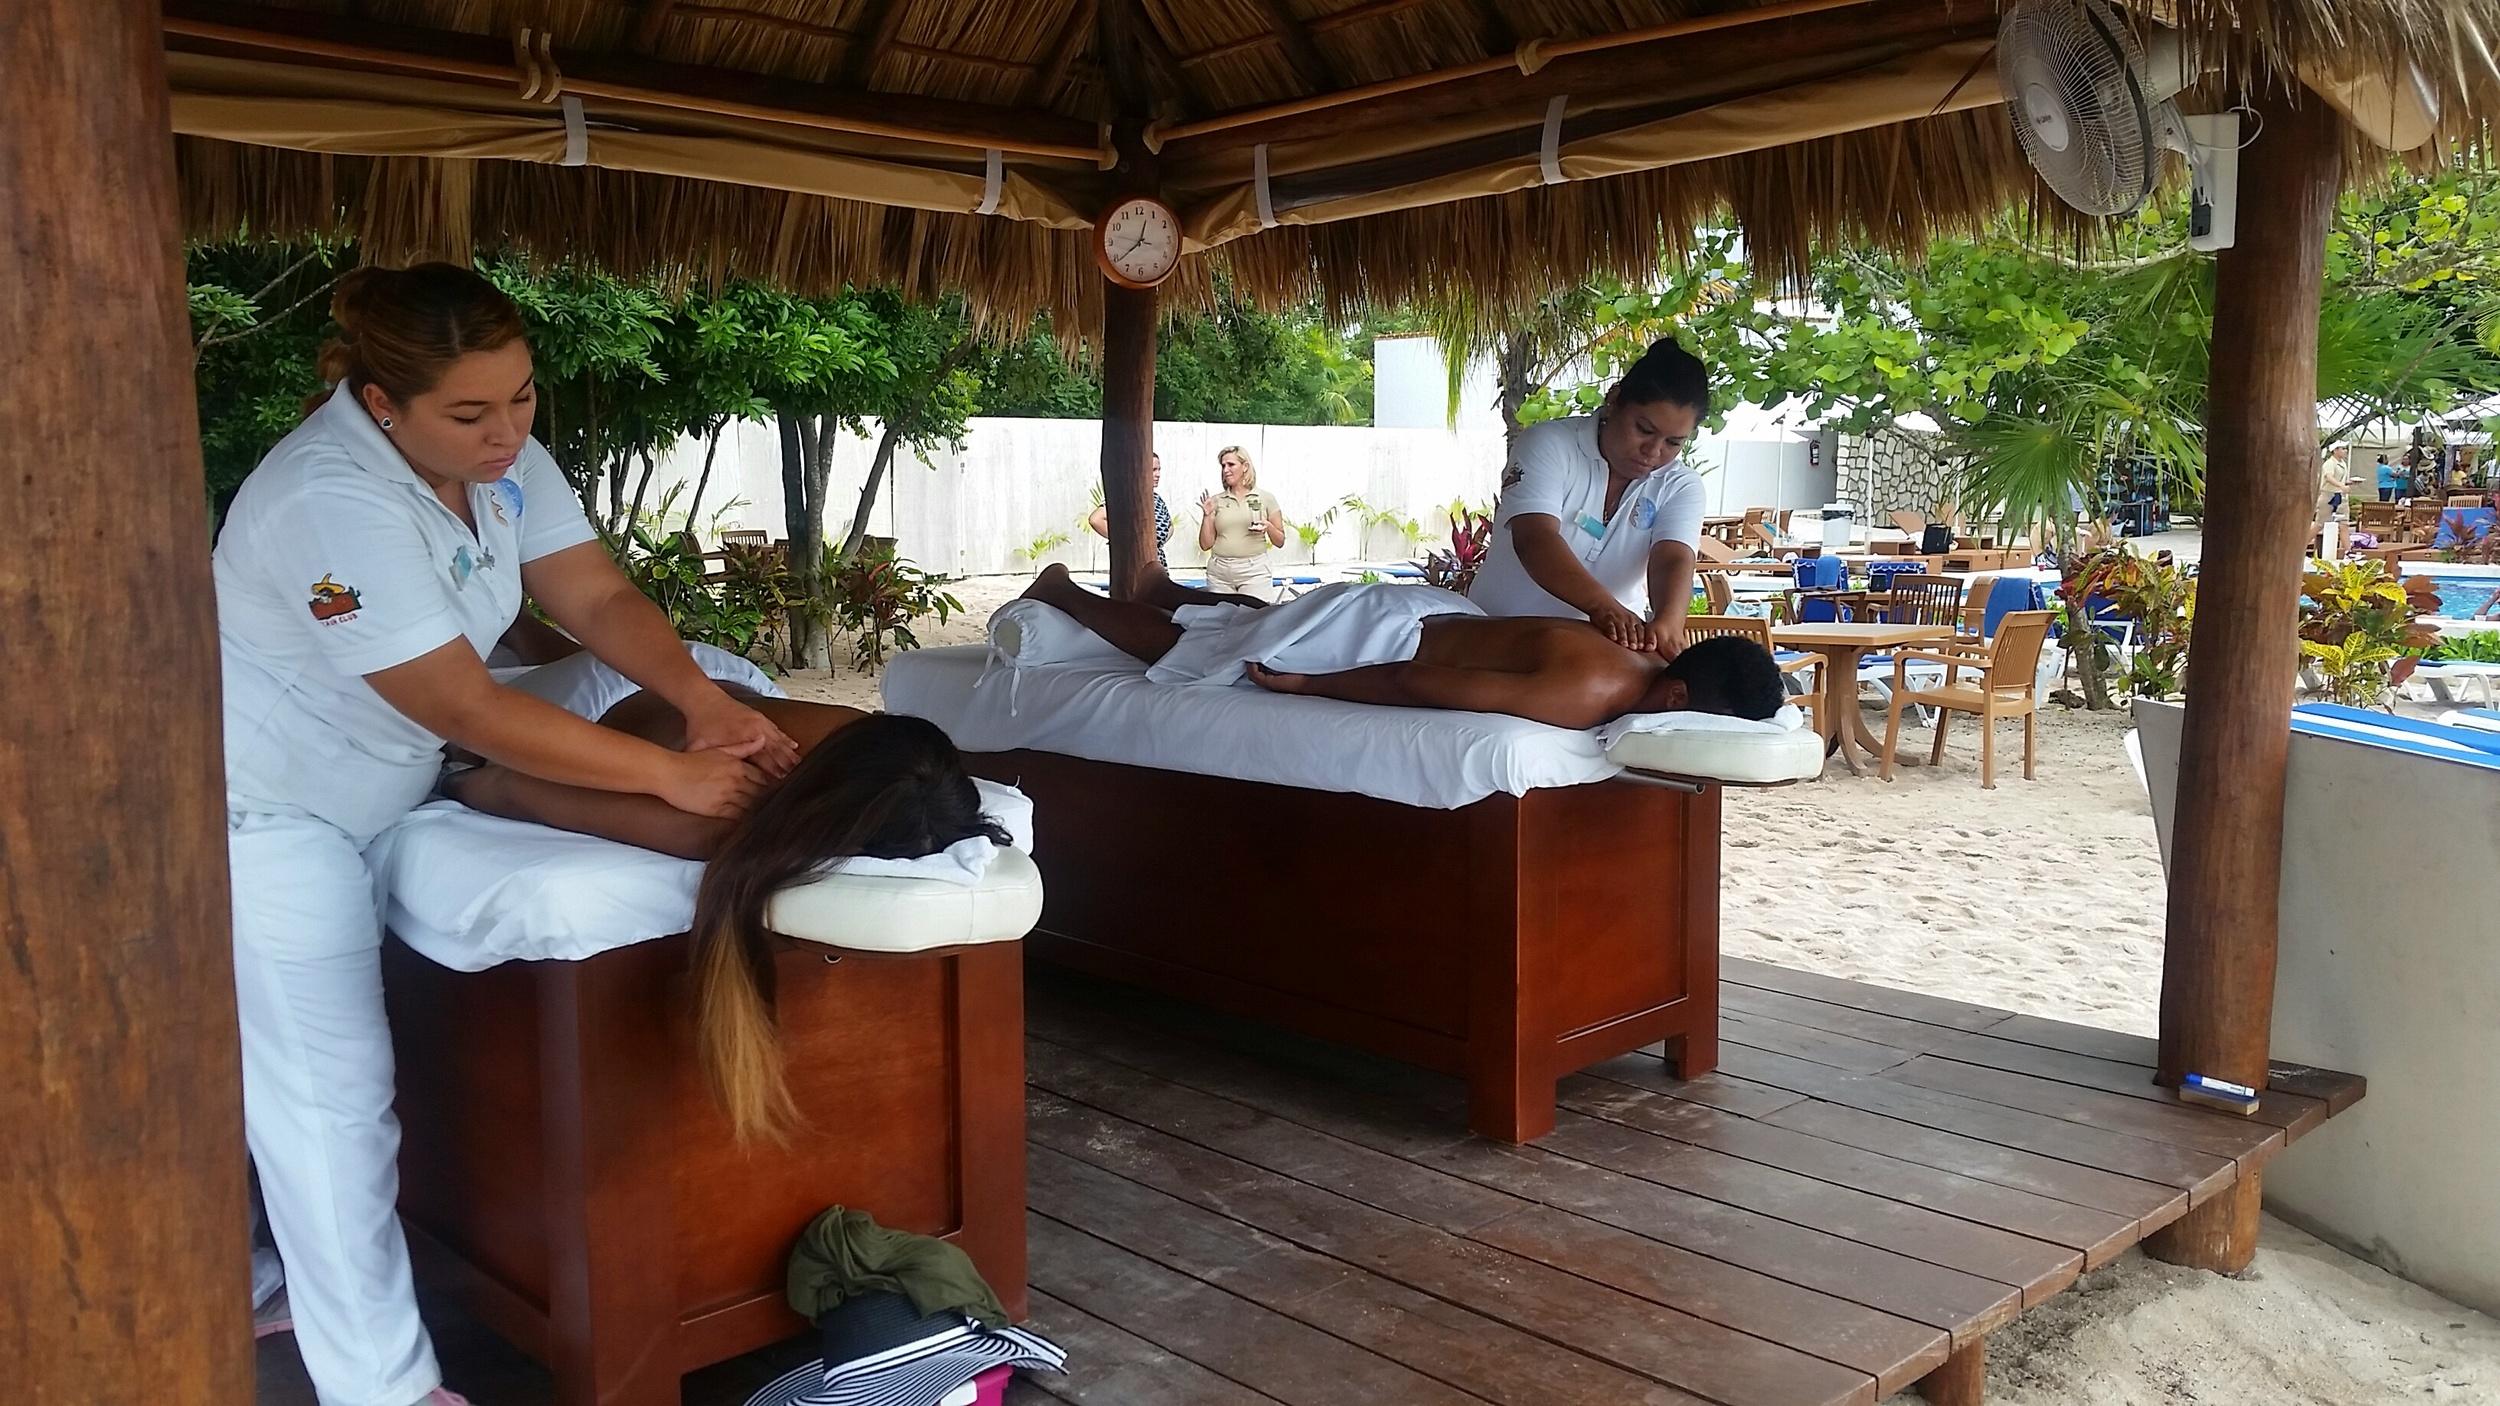 Mr. Sancho's Massage Hut